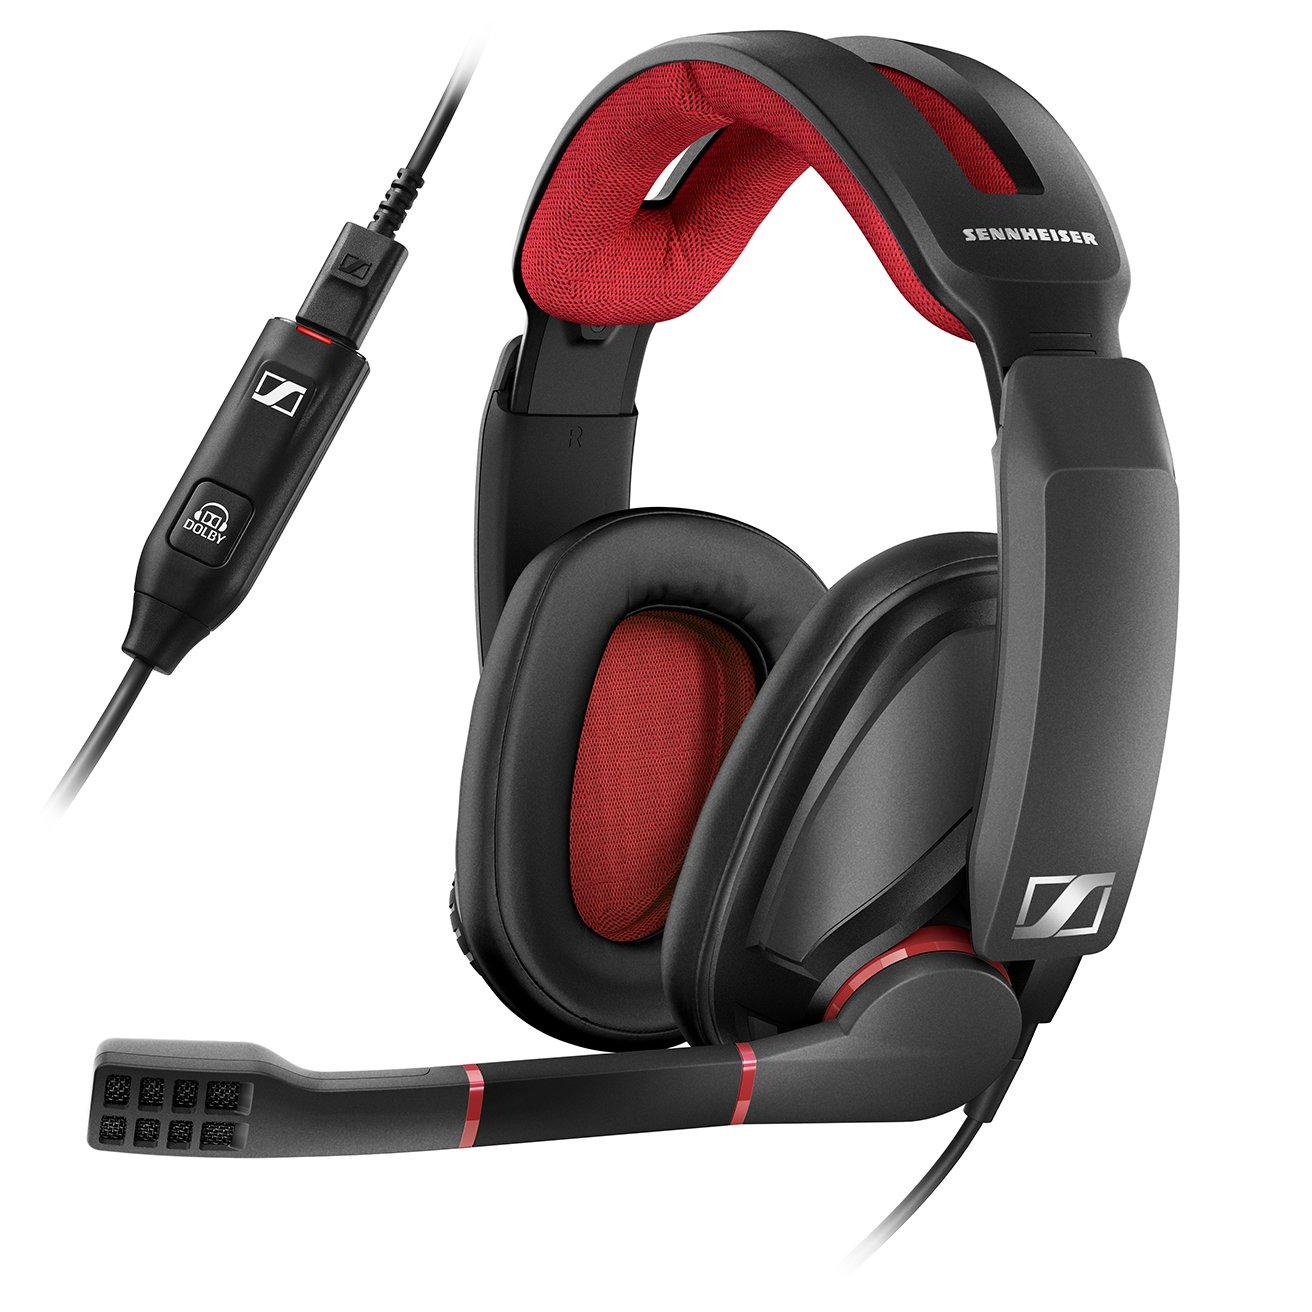 Billede af EPOS - Sennheiser - GSP 350 Gaming Headset